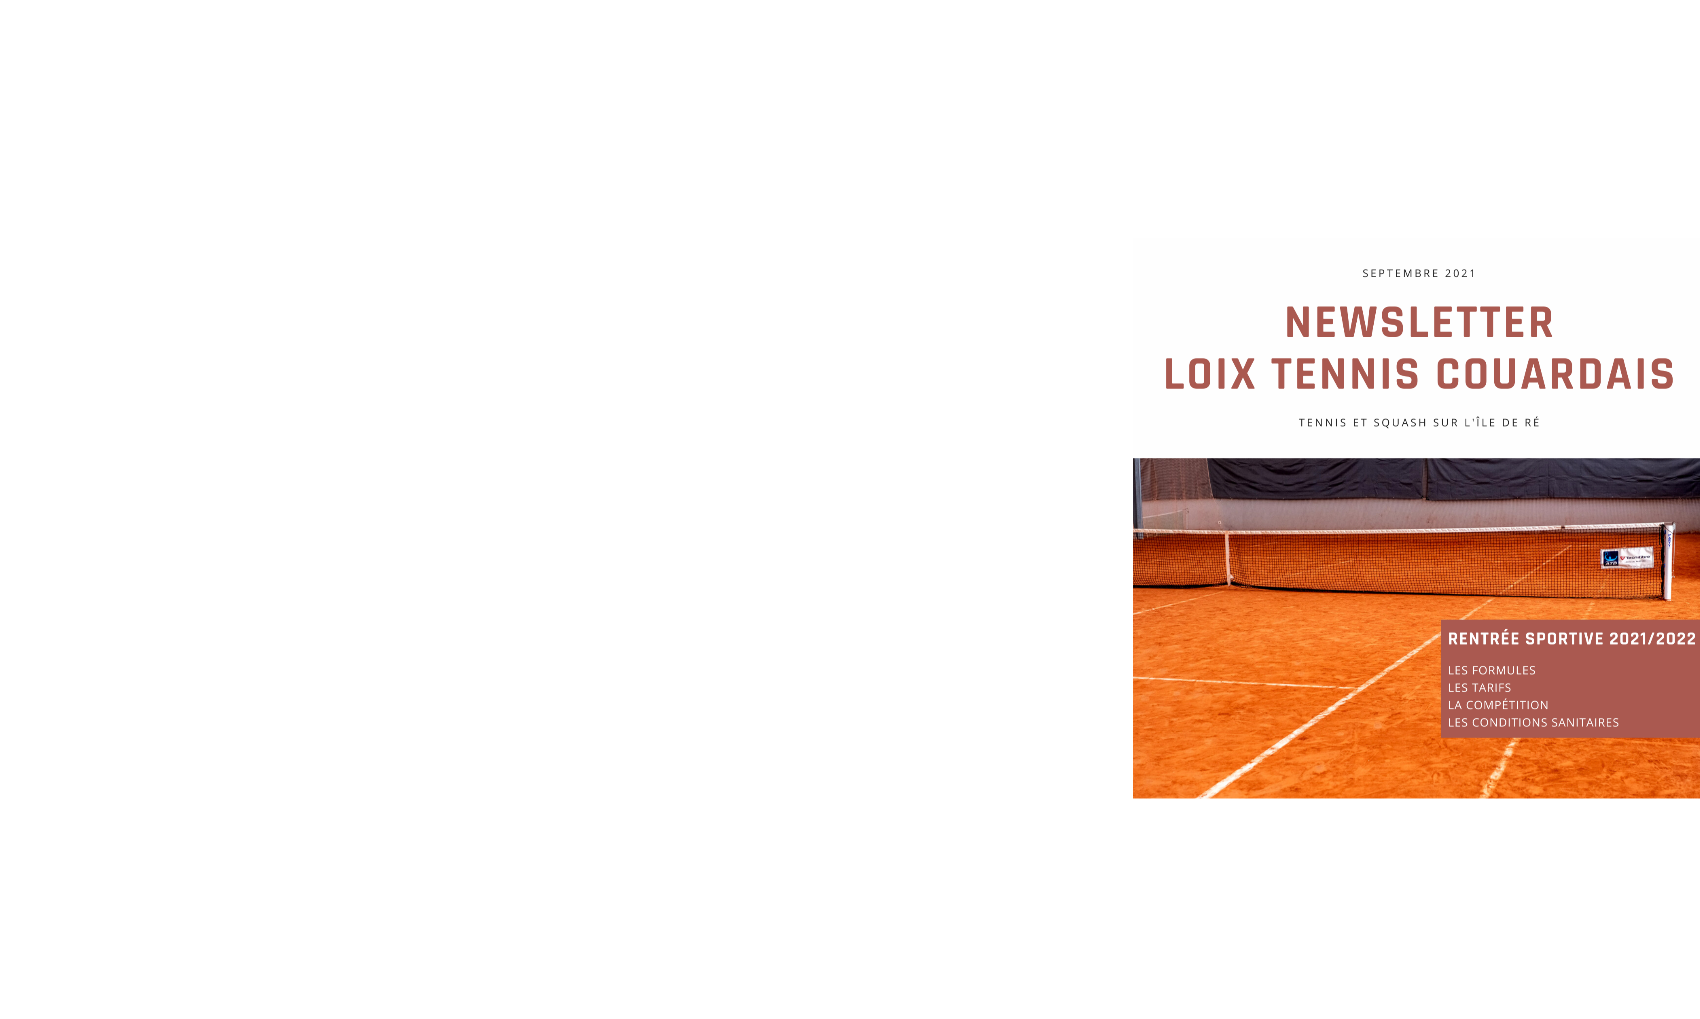 Loix Tennis Couardais